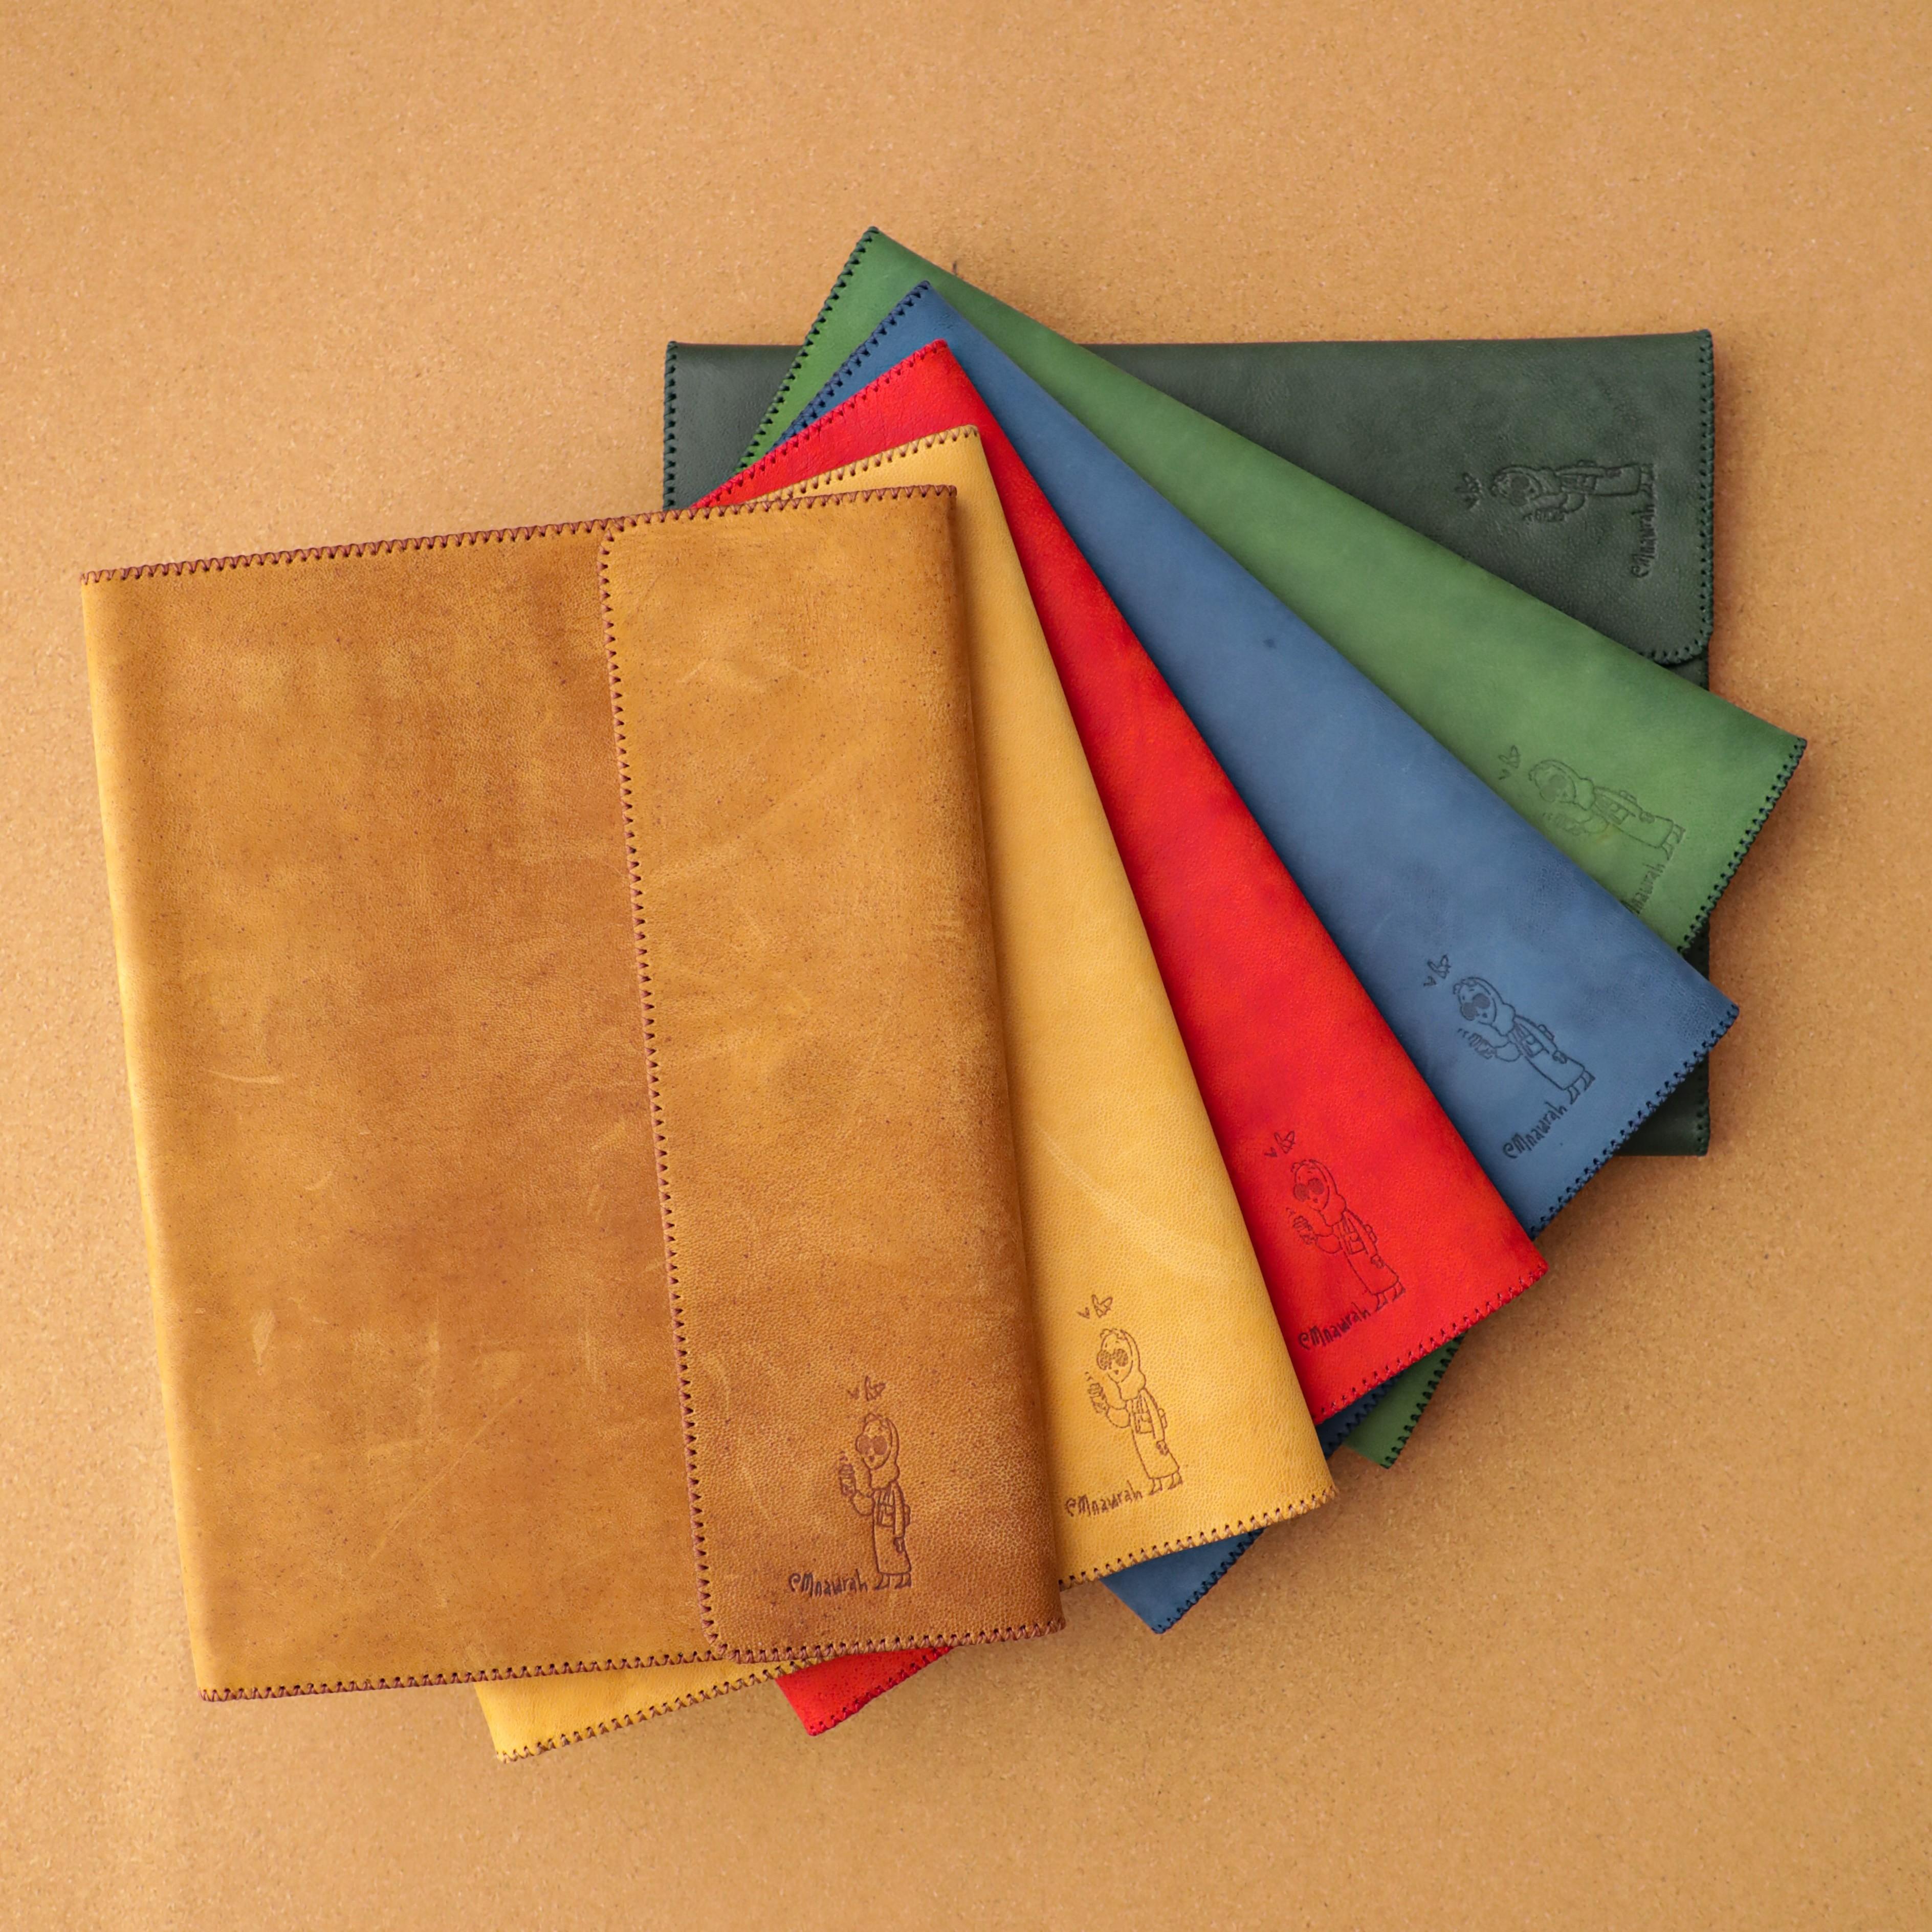 MNAWRAH Portfolio - Handmade Camel Leather